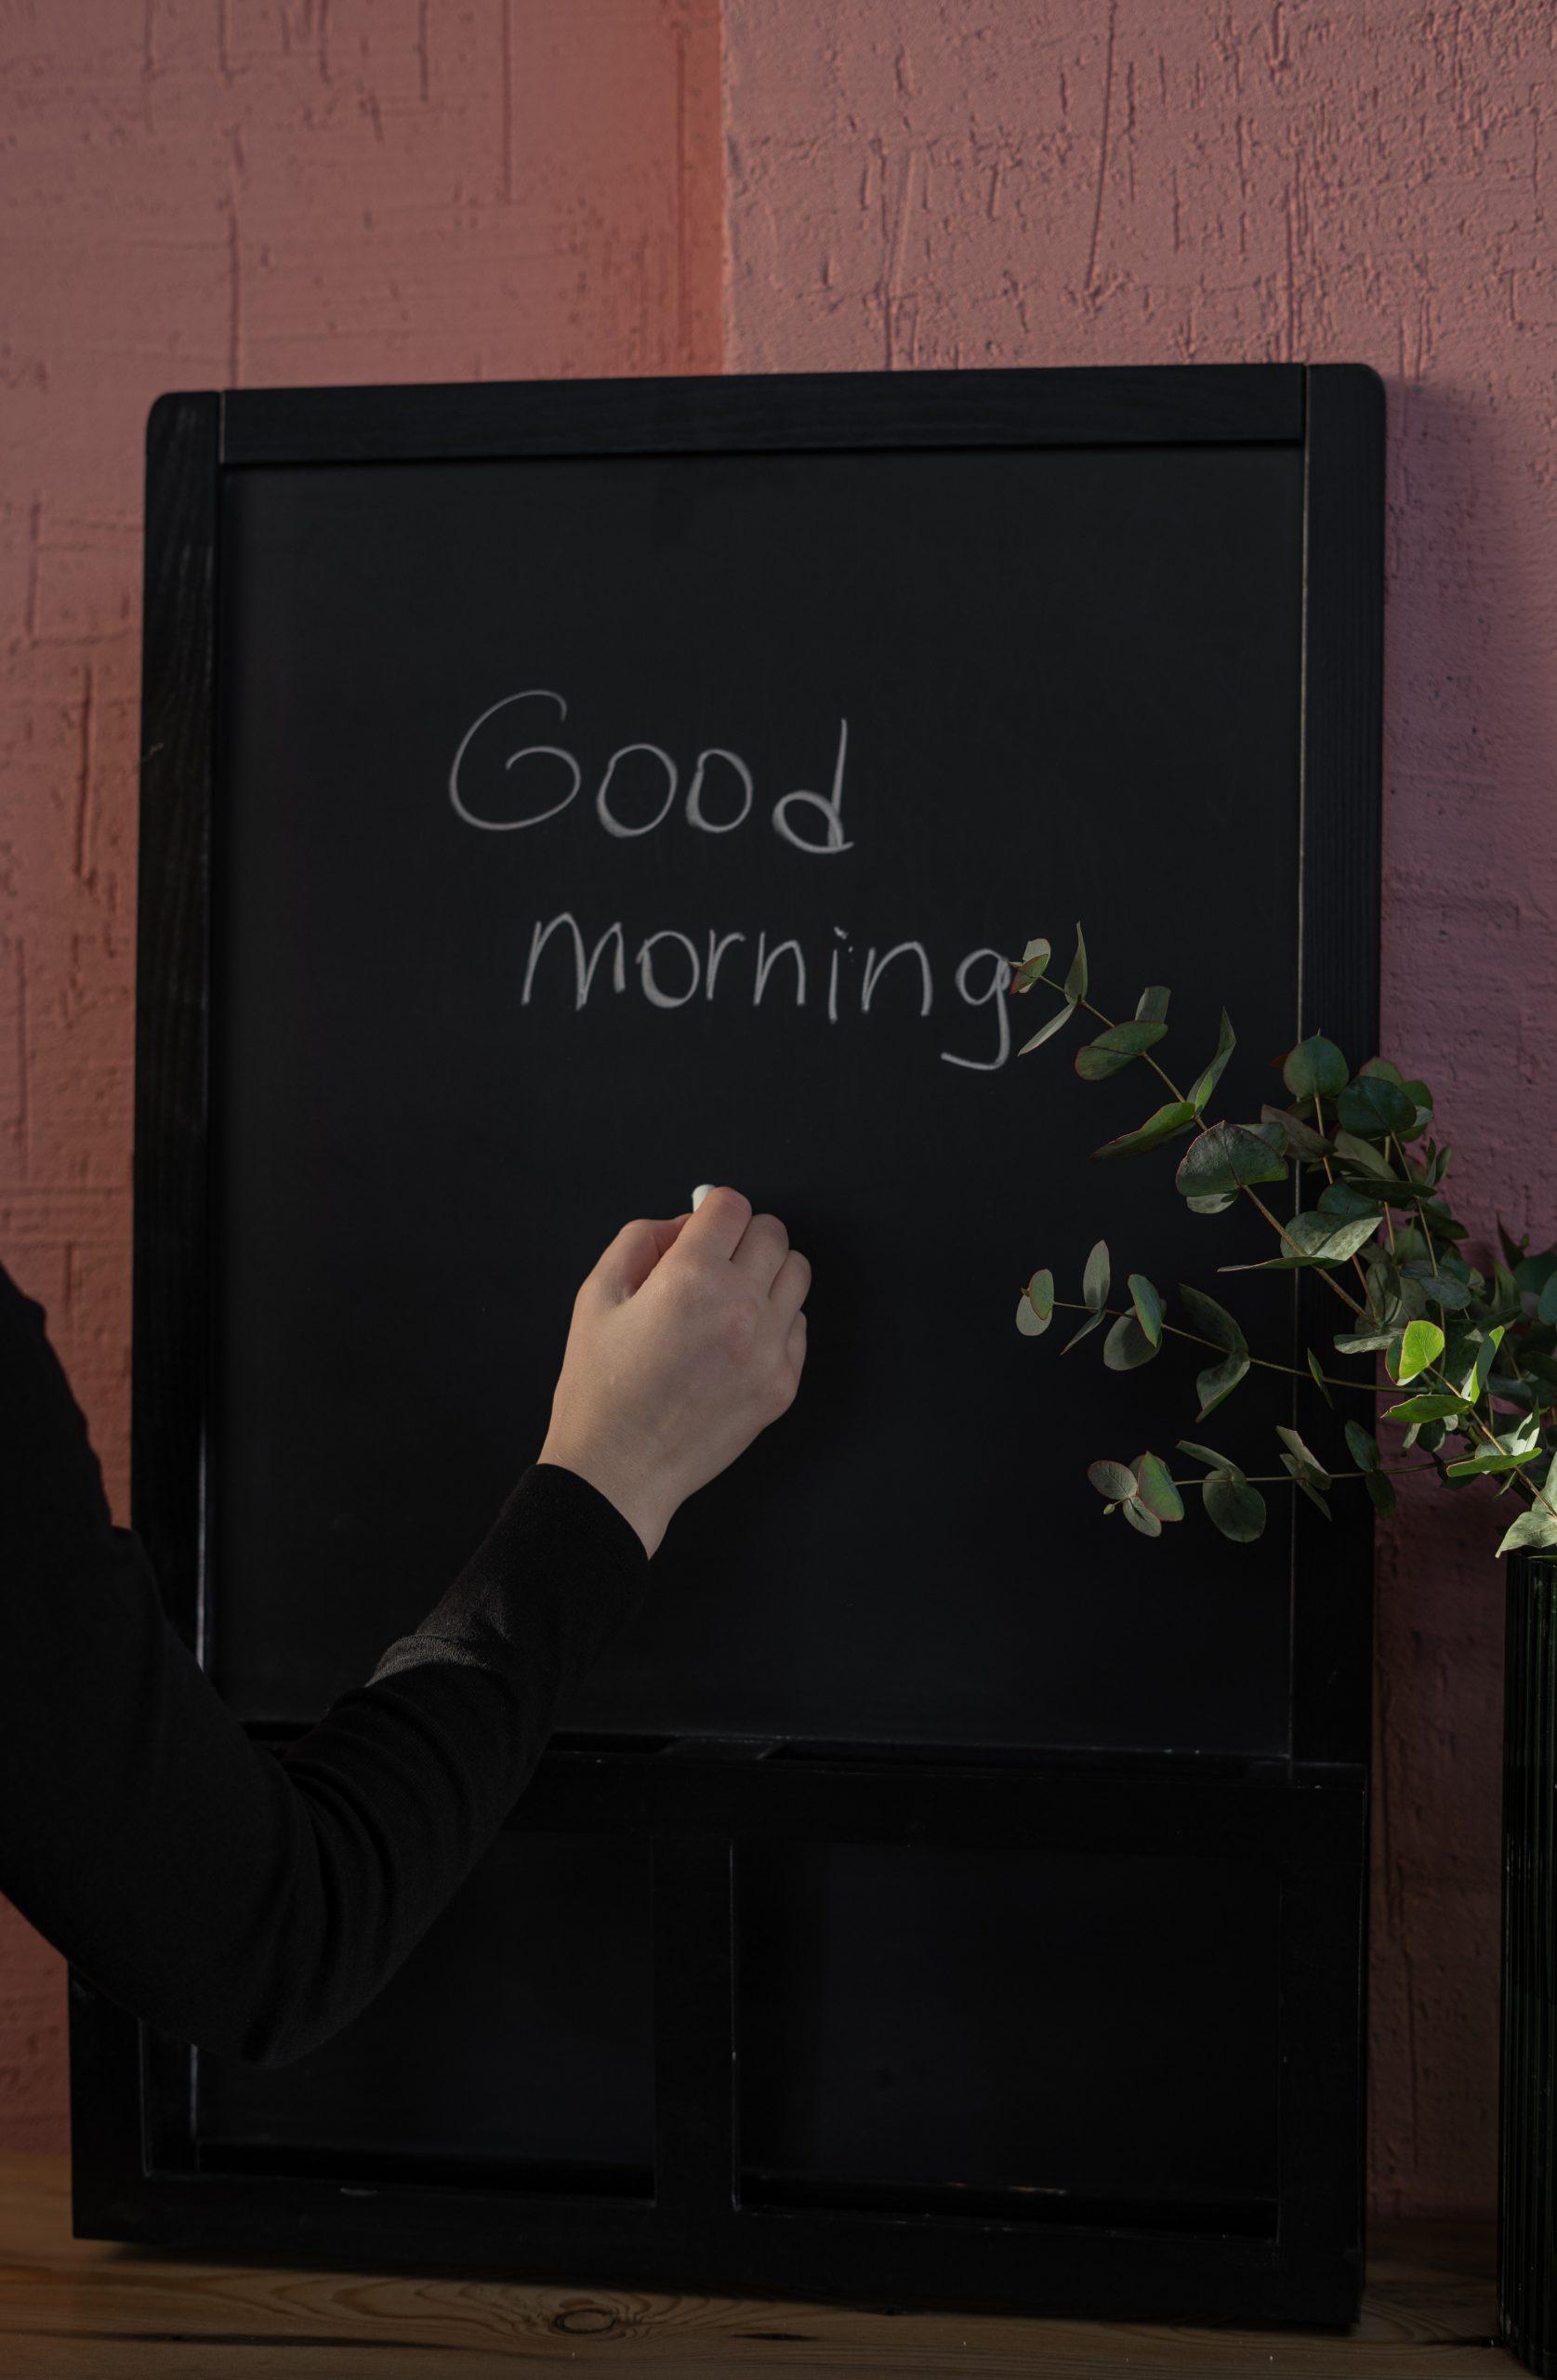 Quotes Good Morning- websplashers